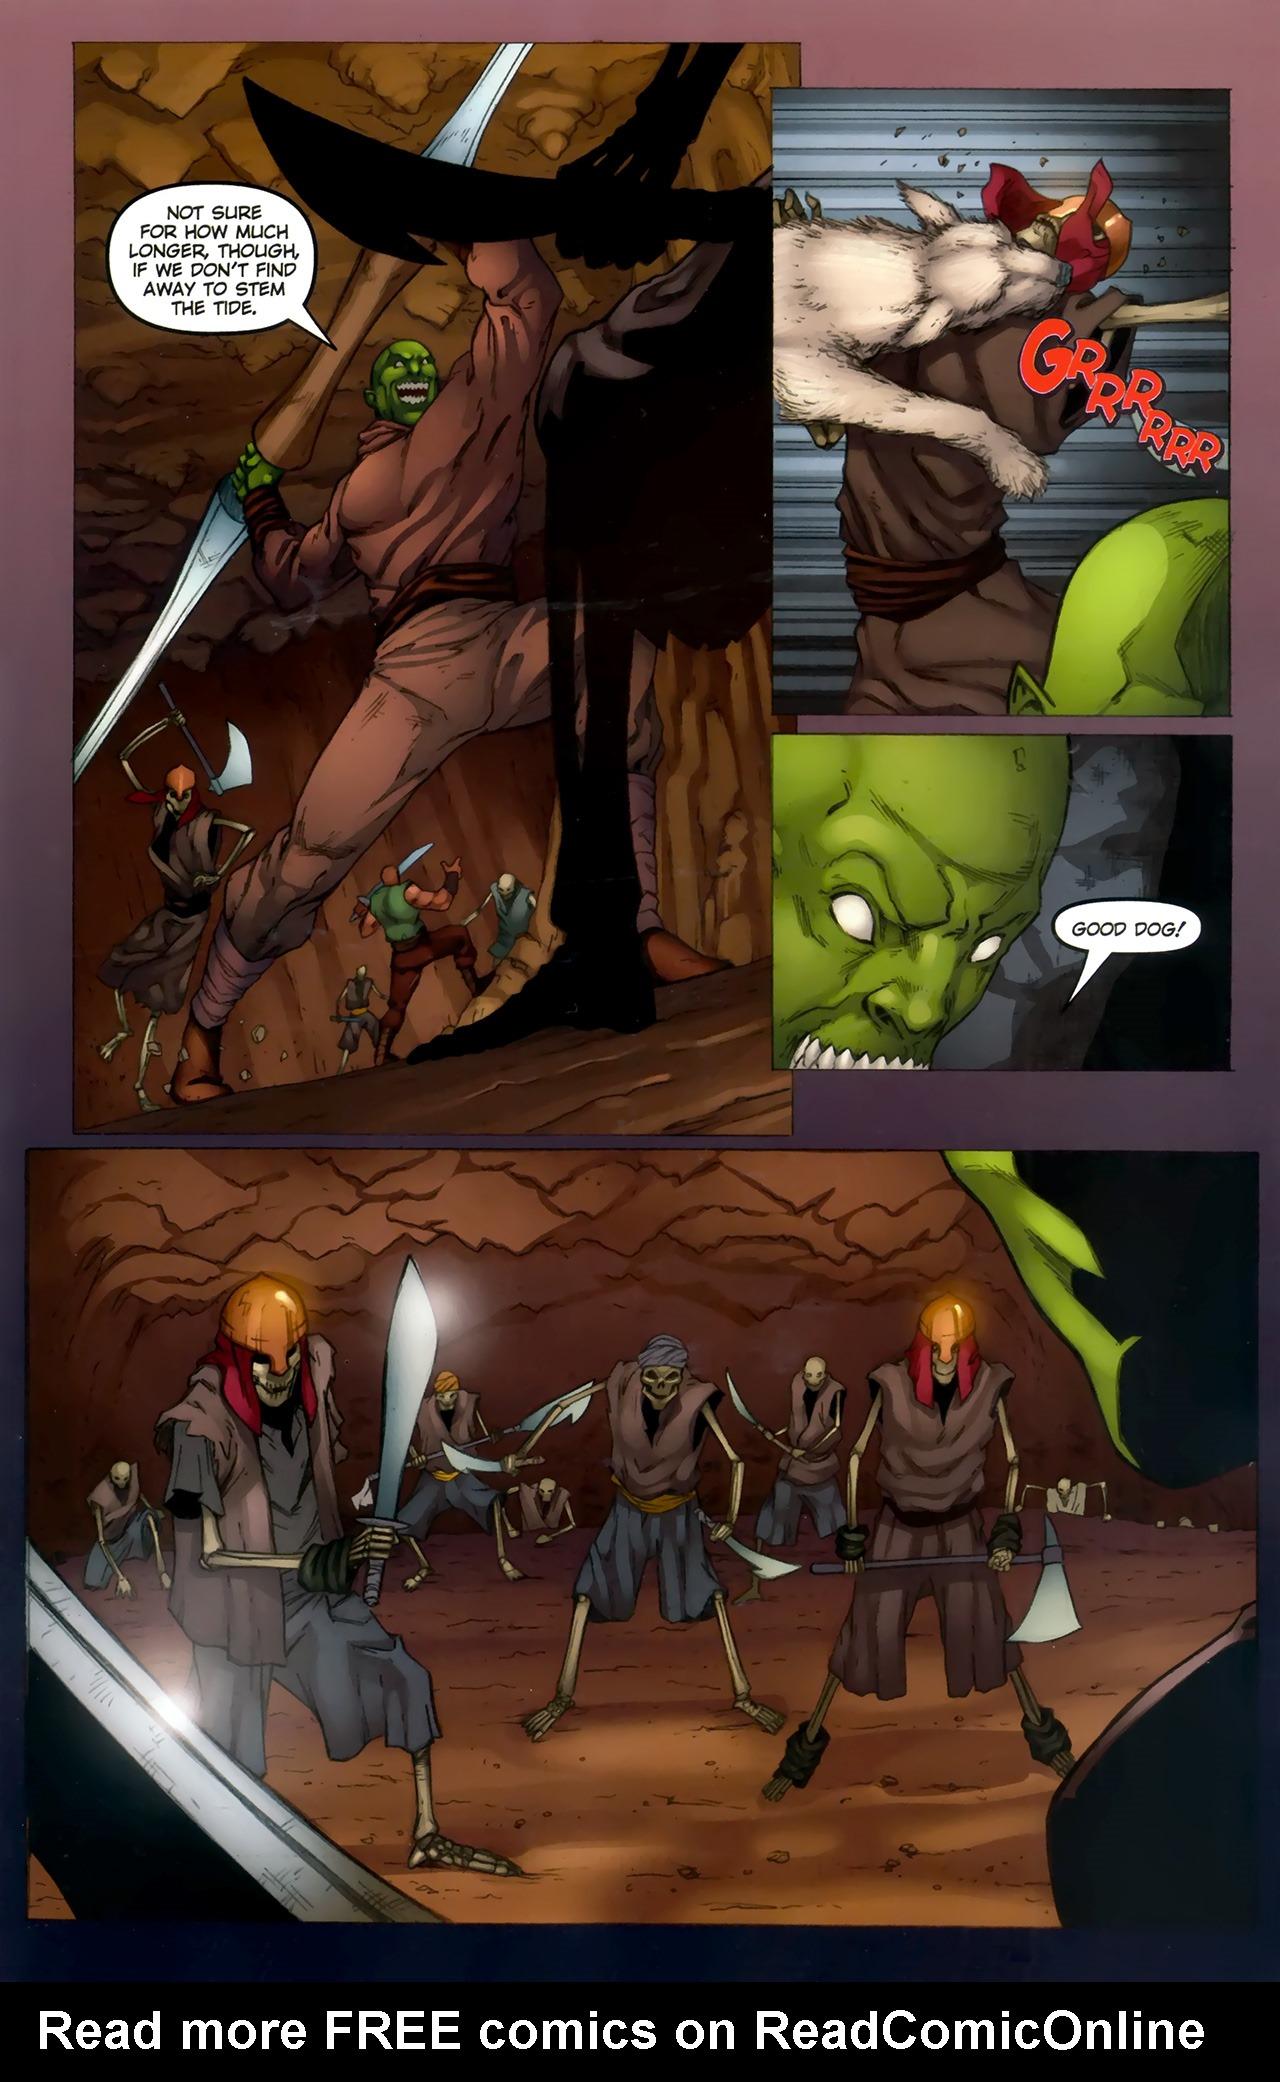 Read online 1001 Arabian Nights: The Adventures of Sinbad comic -  Issue #11 - 17